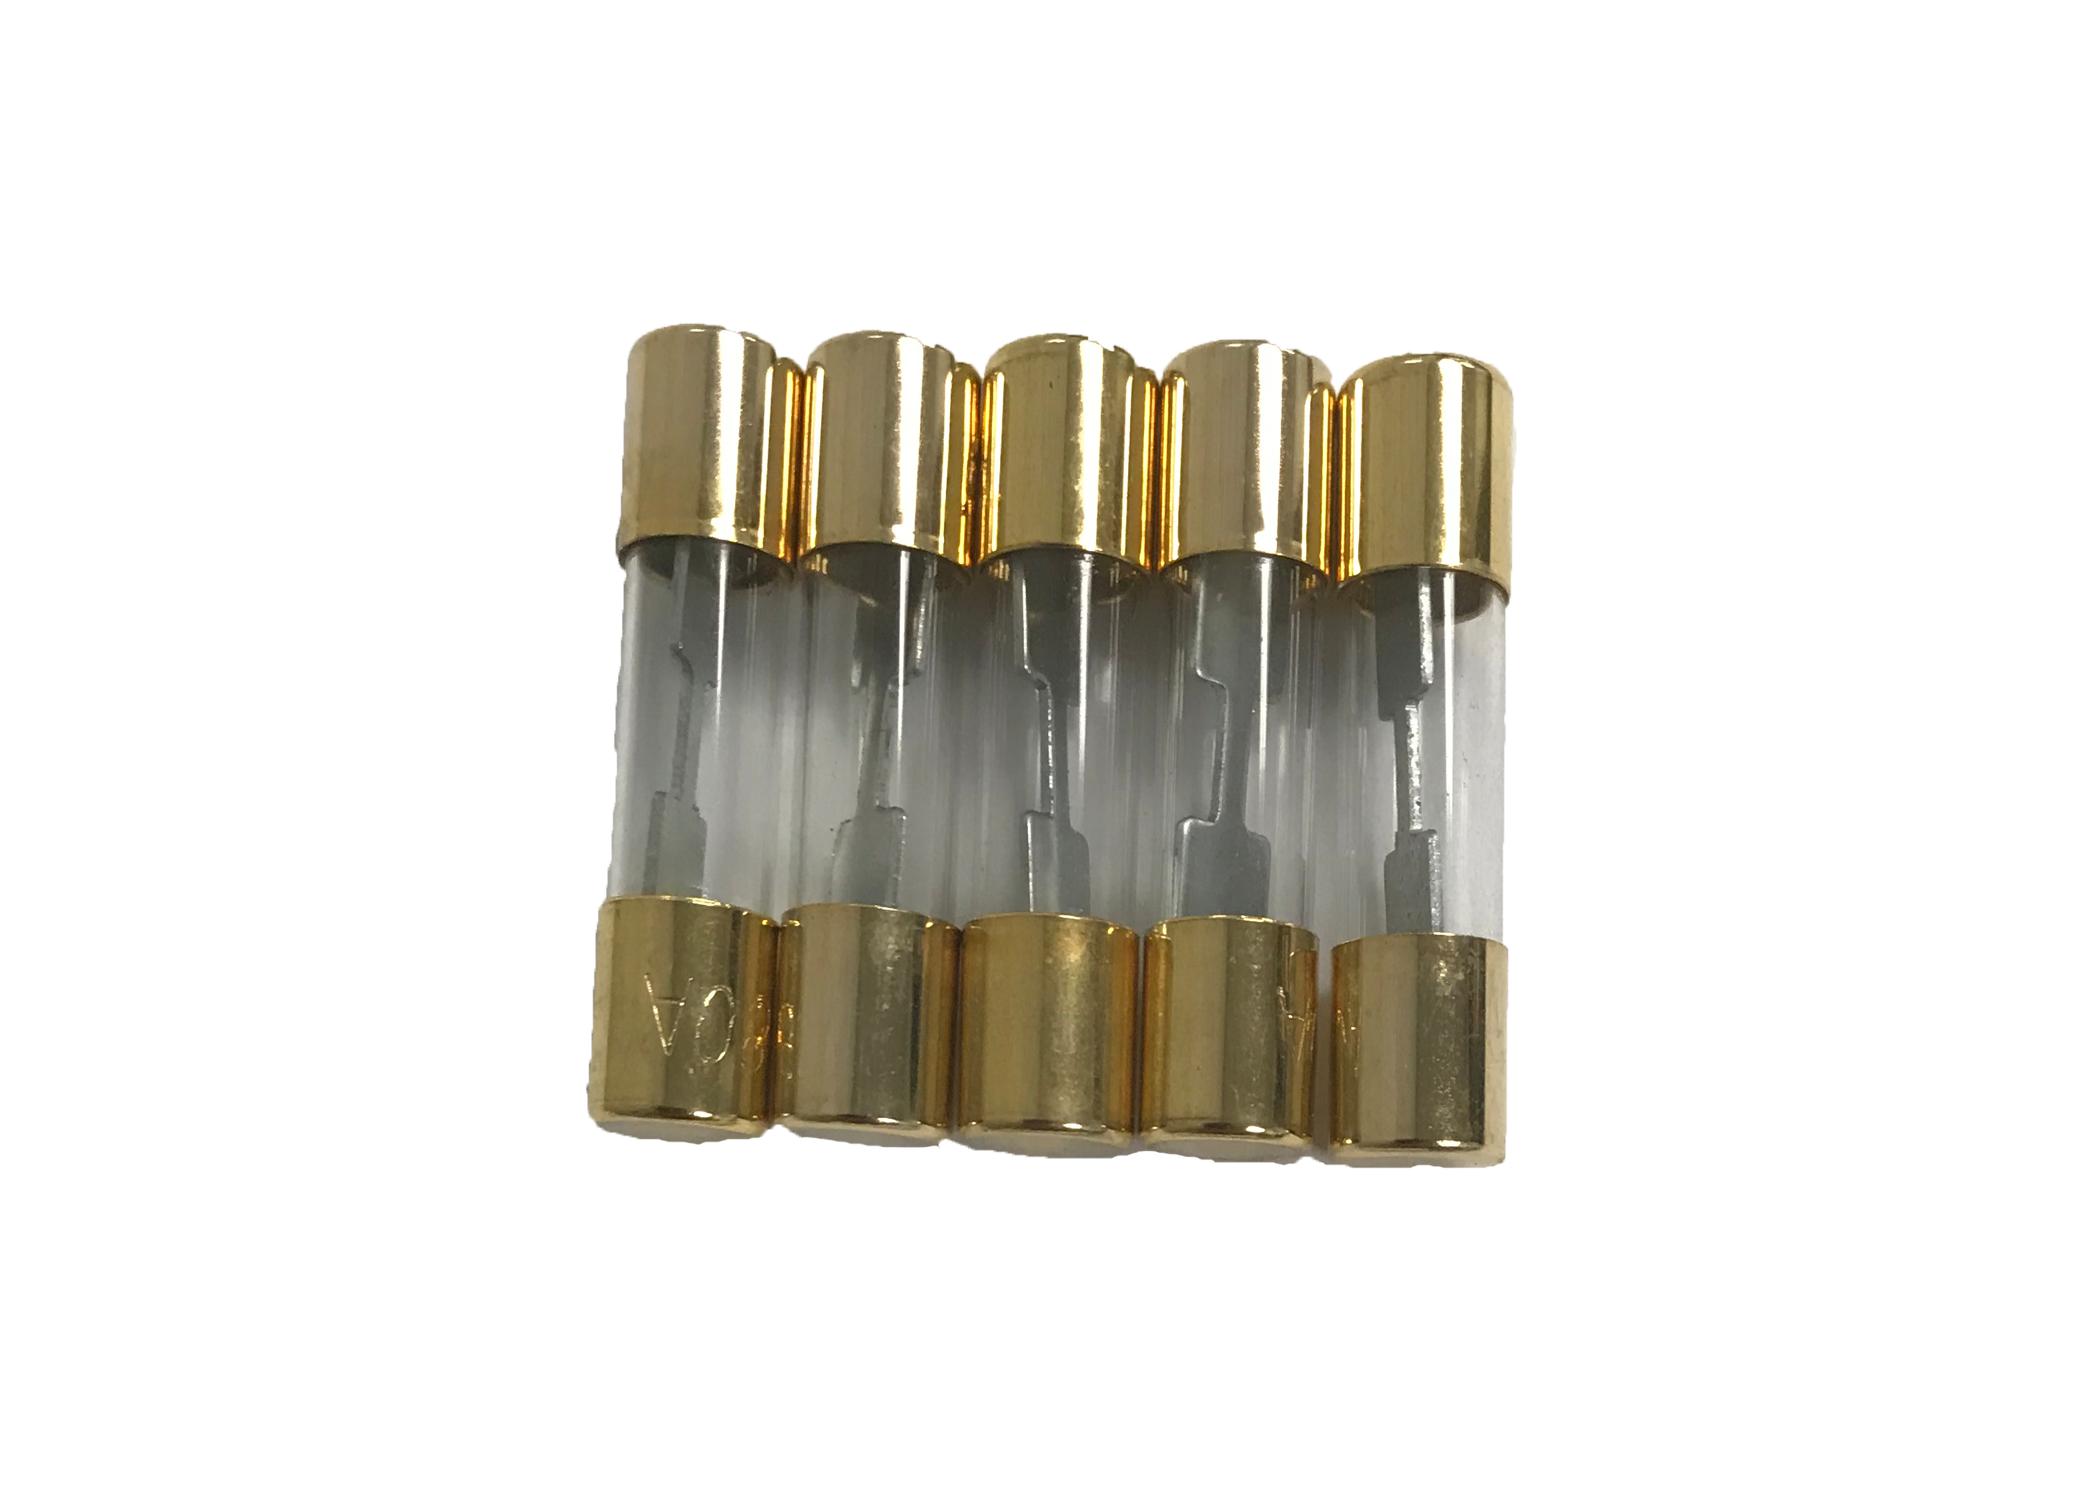 AGUG80 - 80 Amp Gold Agu Fuse ( 5 Pack )